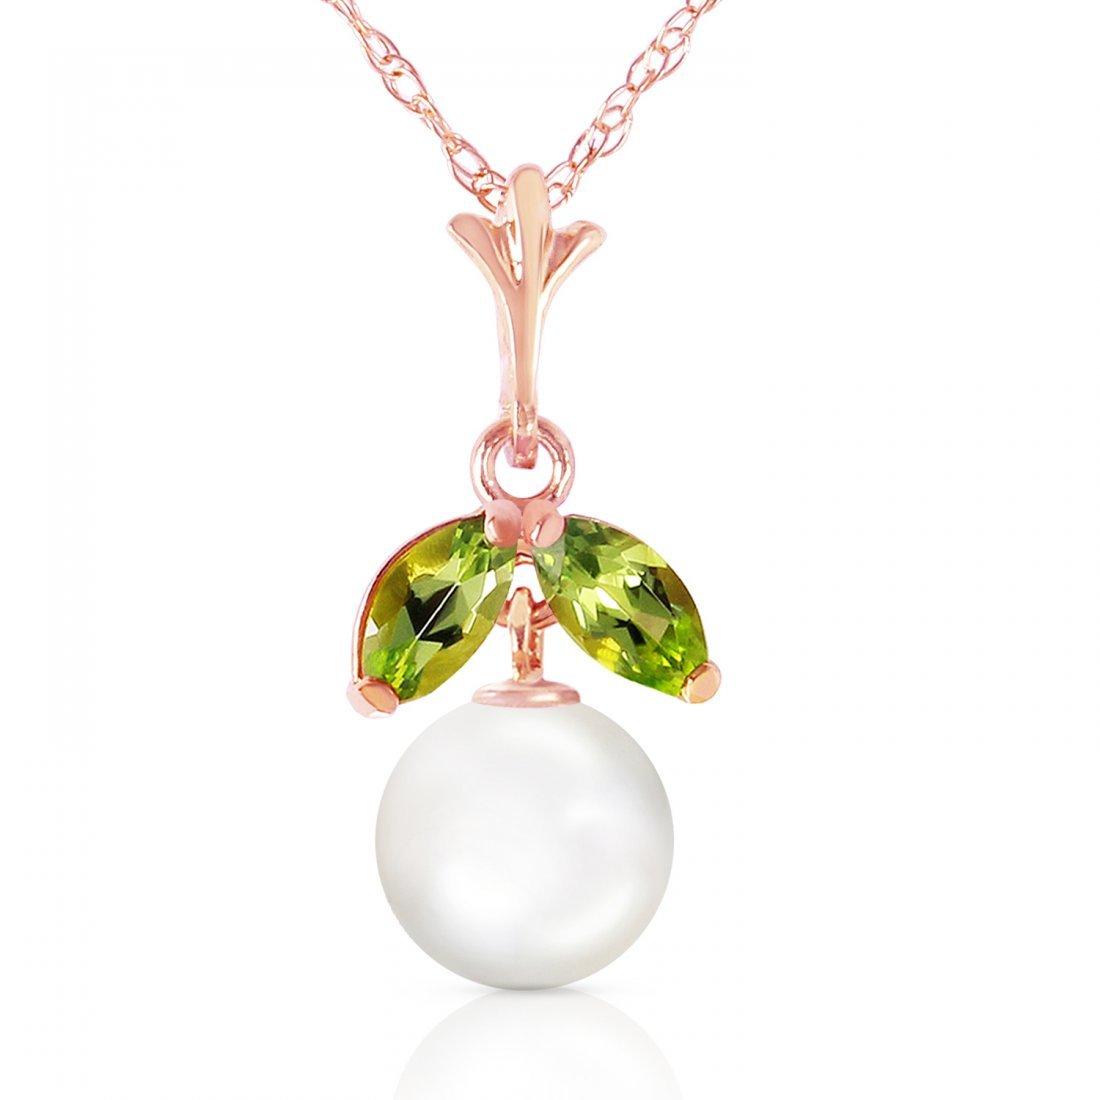 Genuine 2.2 ctw Pearl & Peridot Necklace Jewelry 14KT